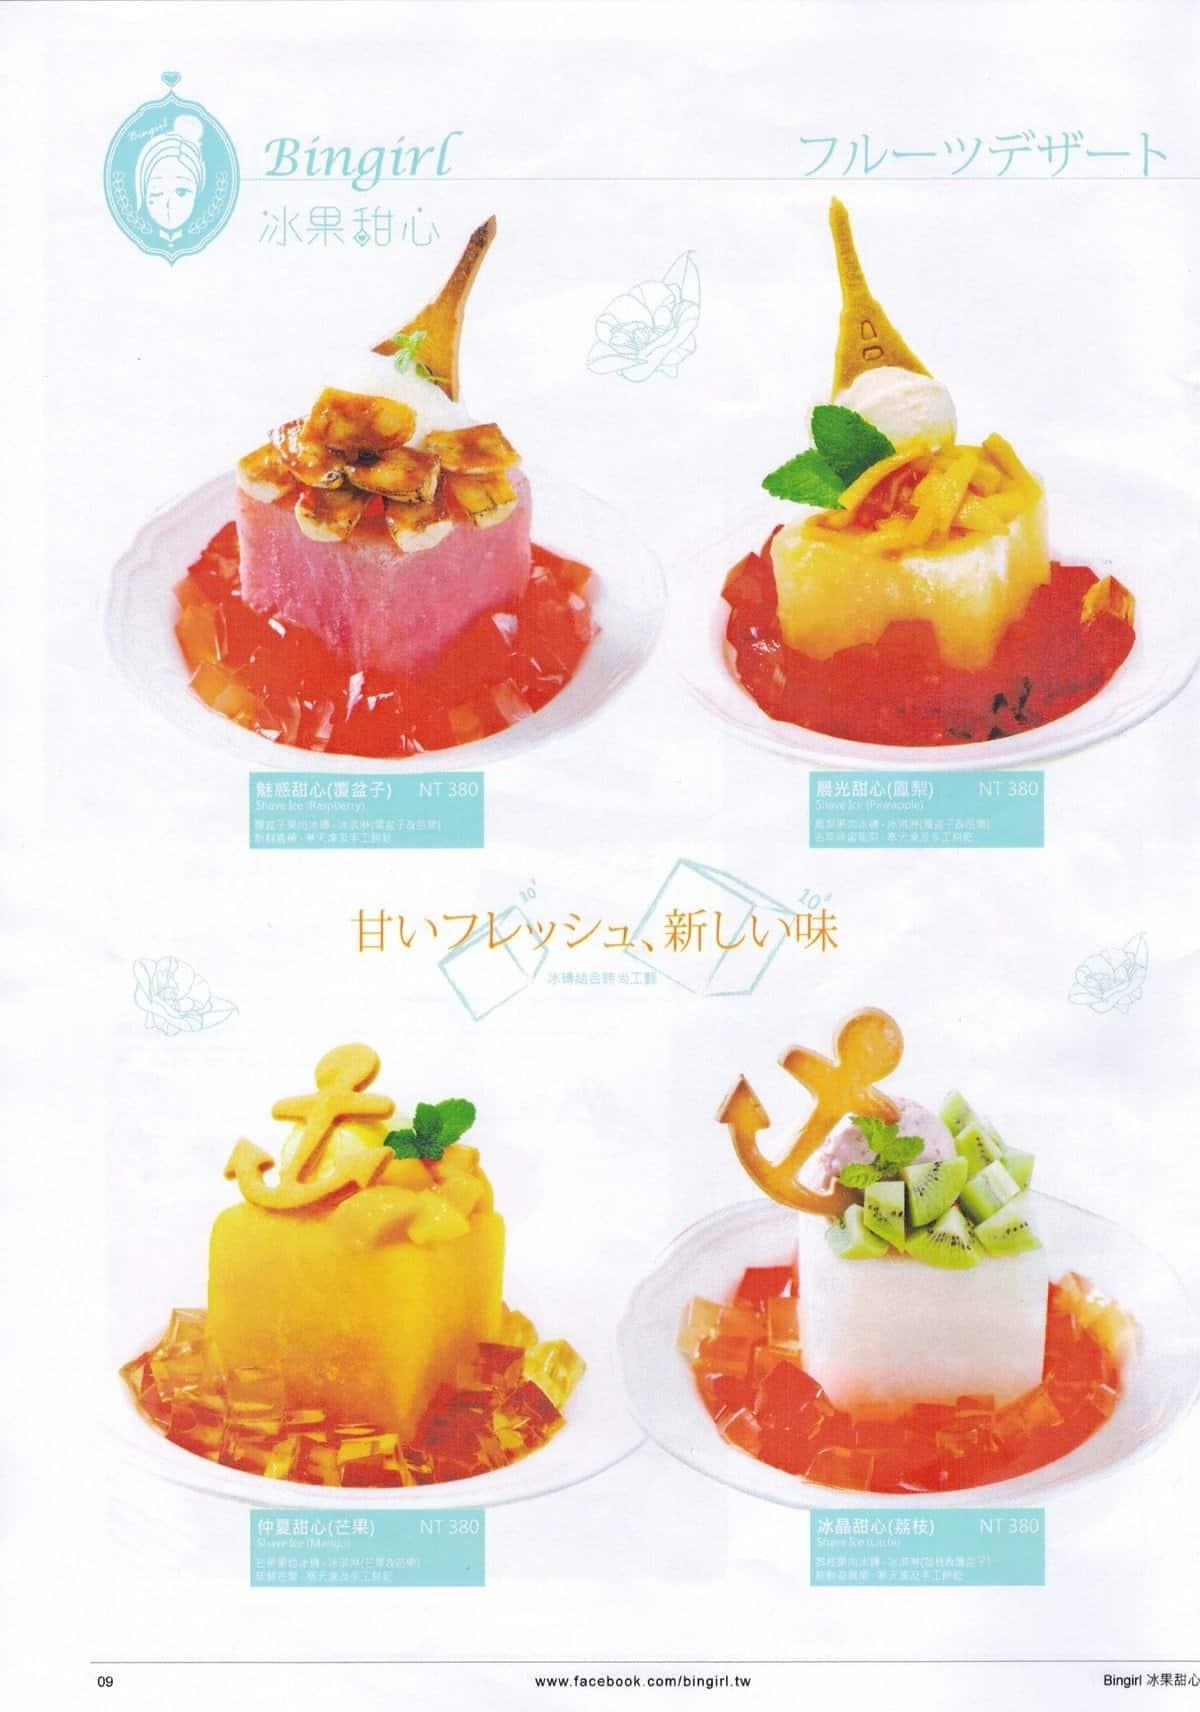 taipei-bingirl-menu10